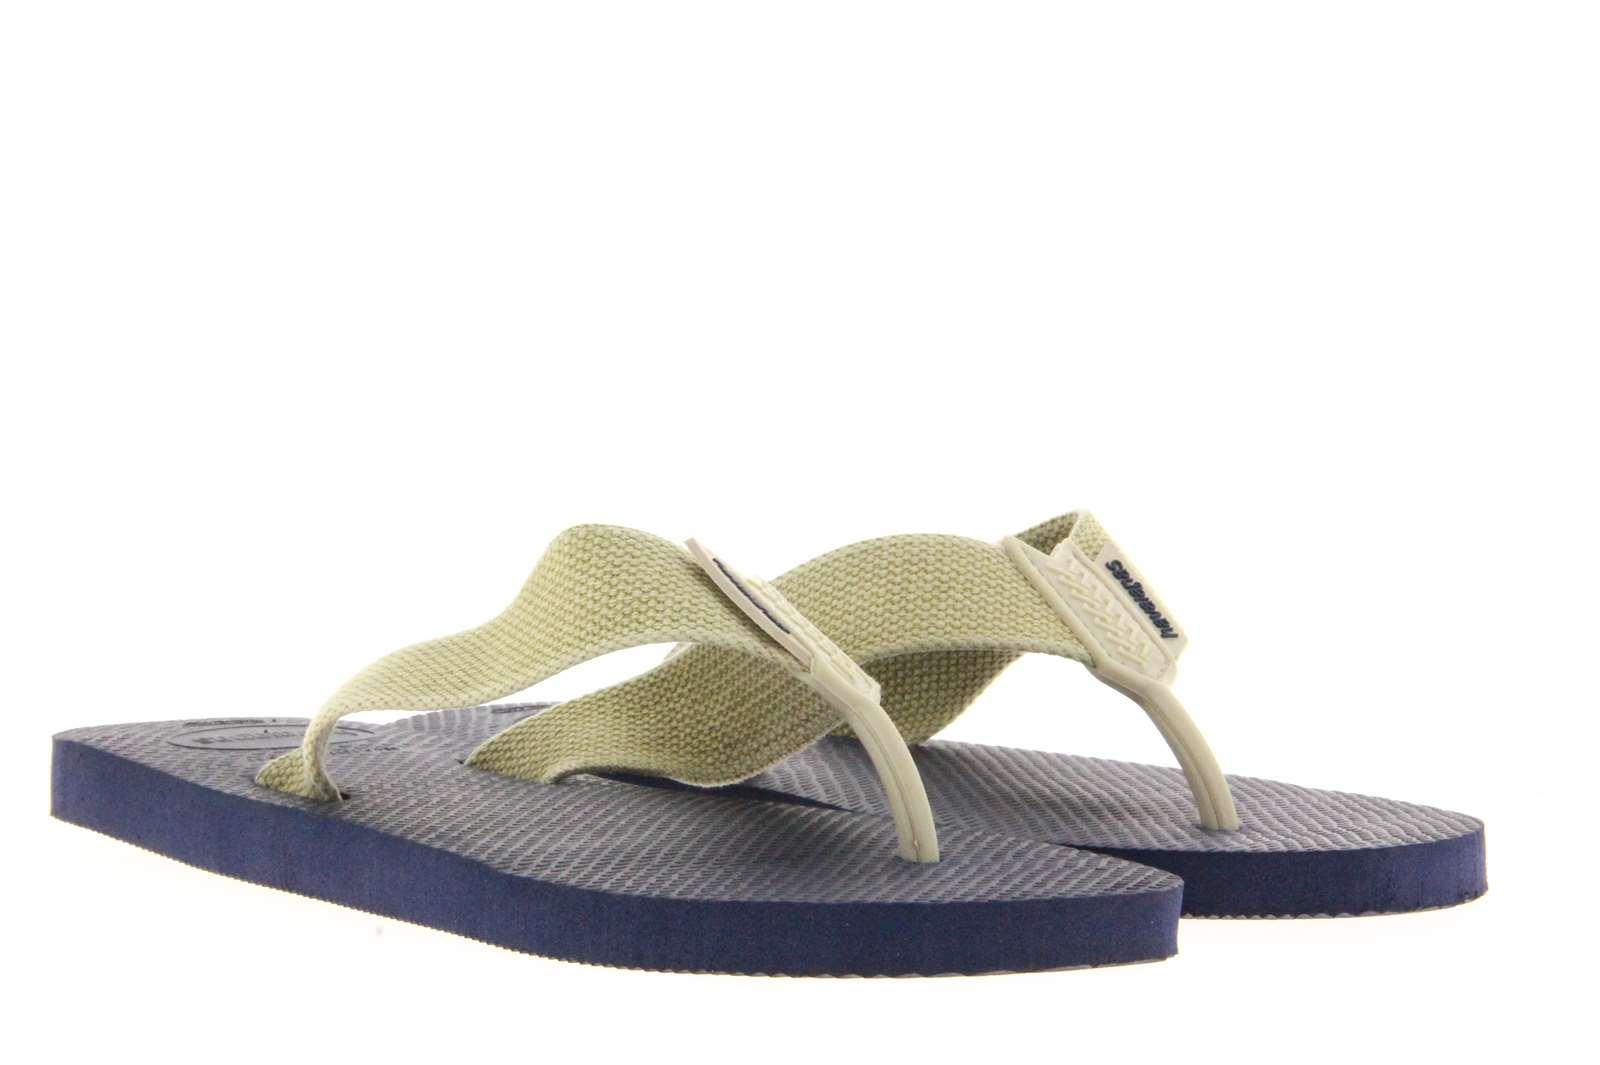 Havaiana toe sandals URBAN NAVY SAND